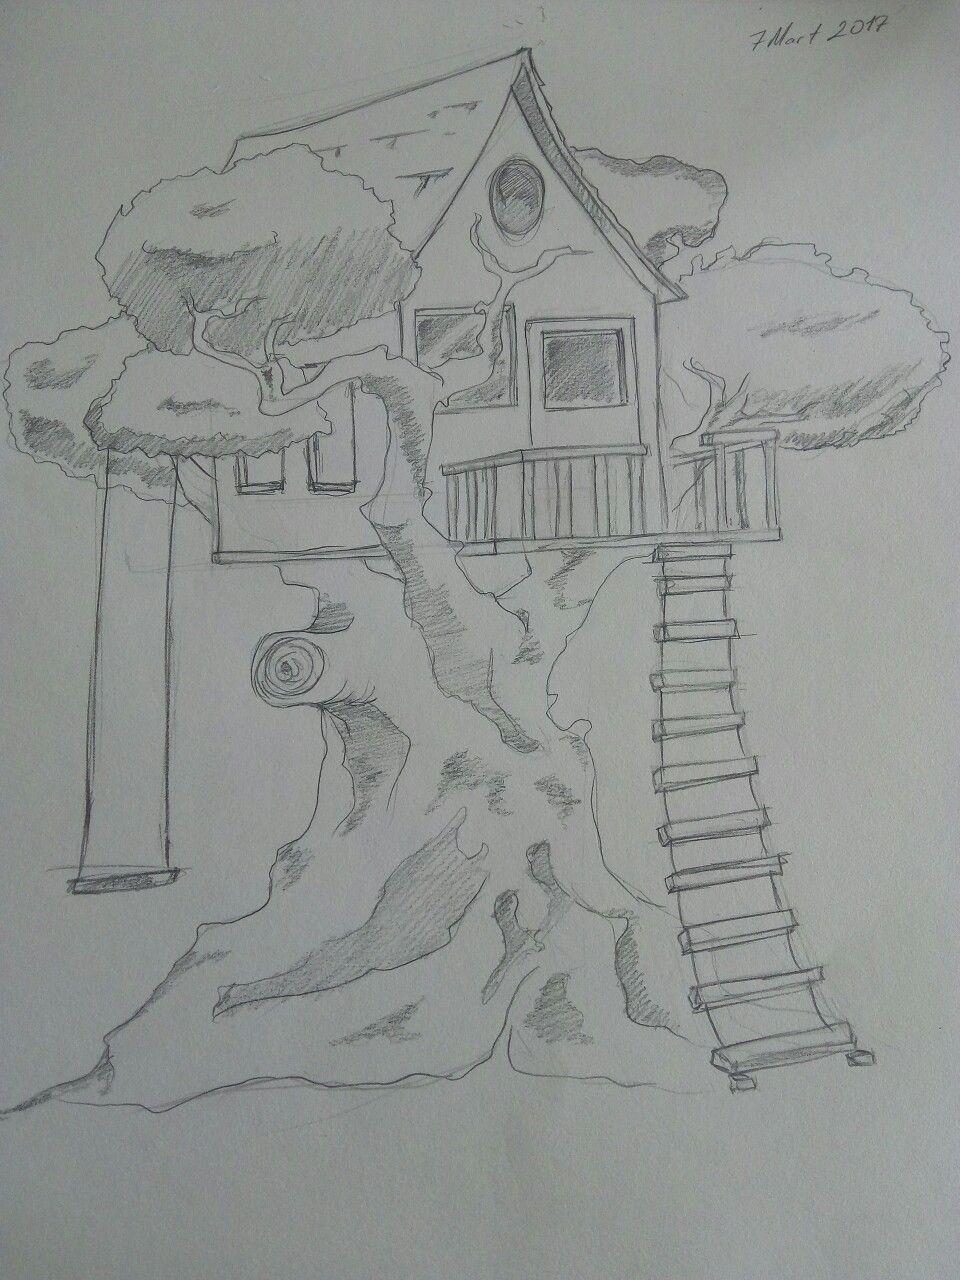 Treehouse house garden draw stairs salıncak | Desenhos escuros, Desenhos,  Atelier